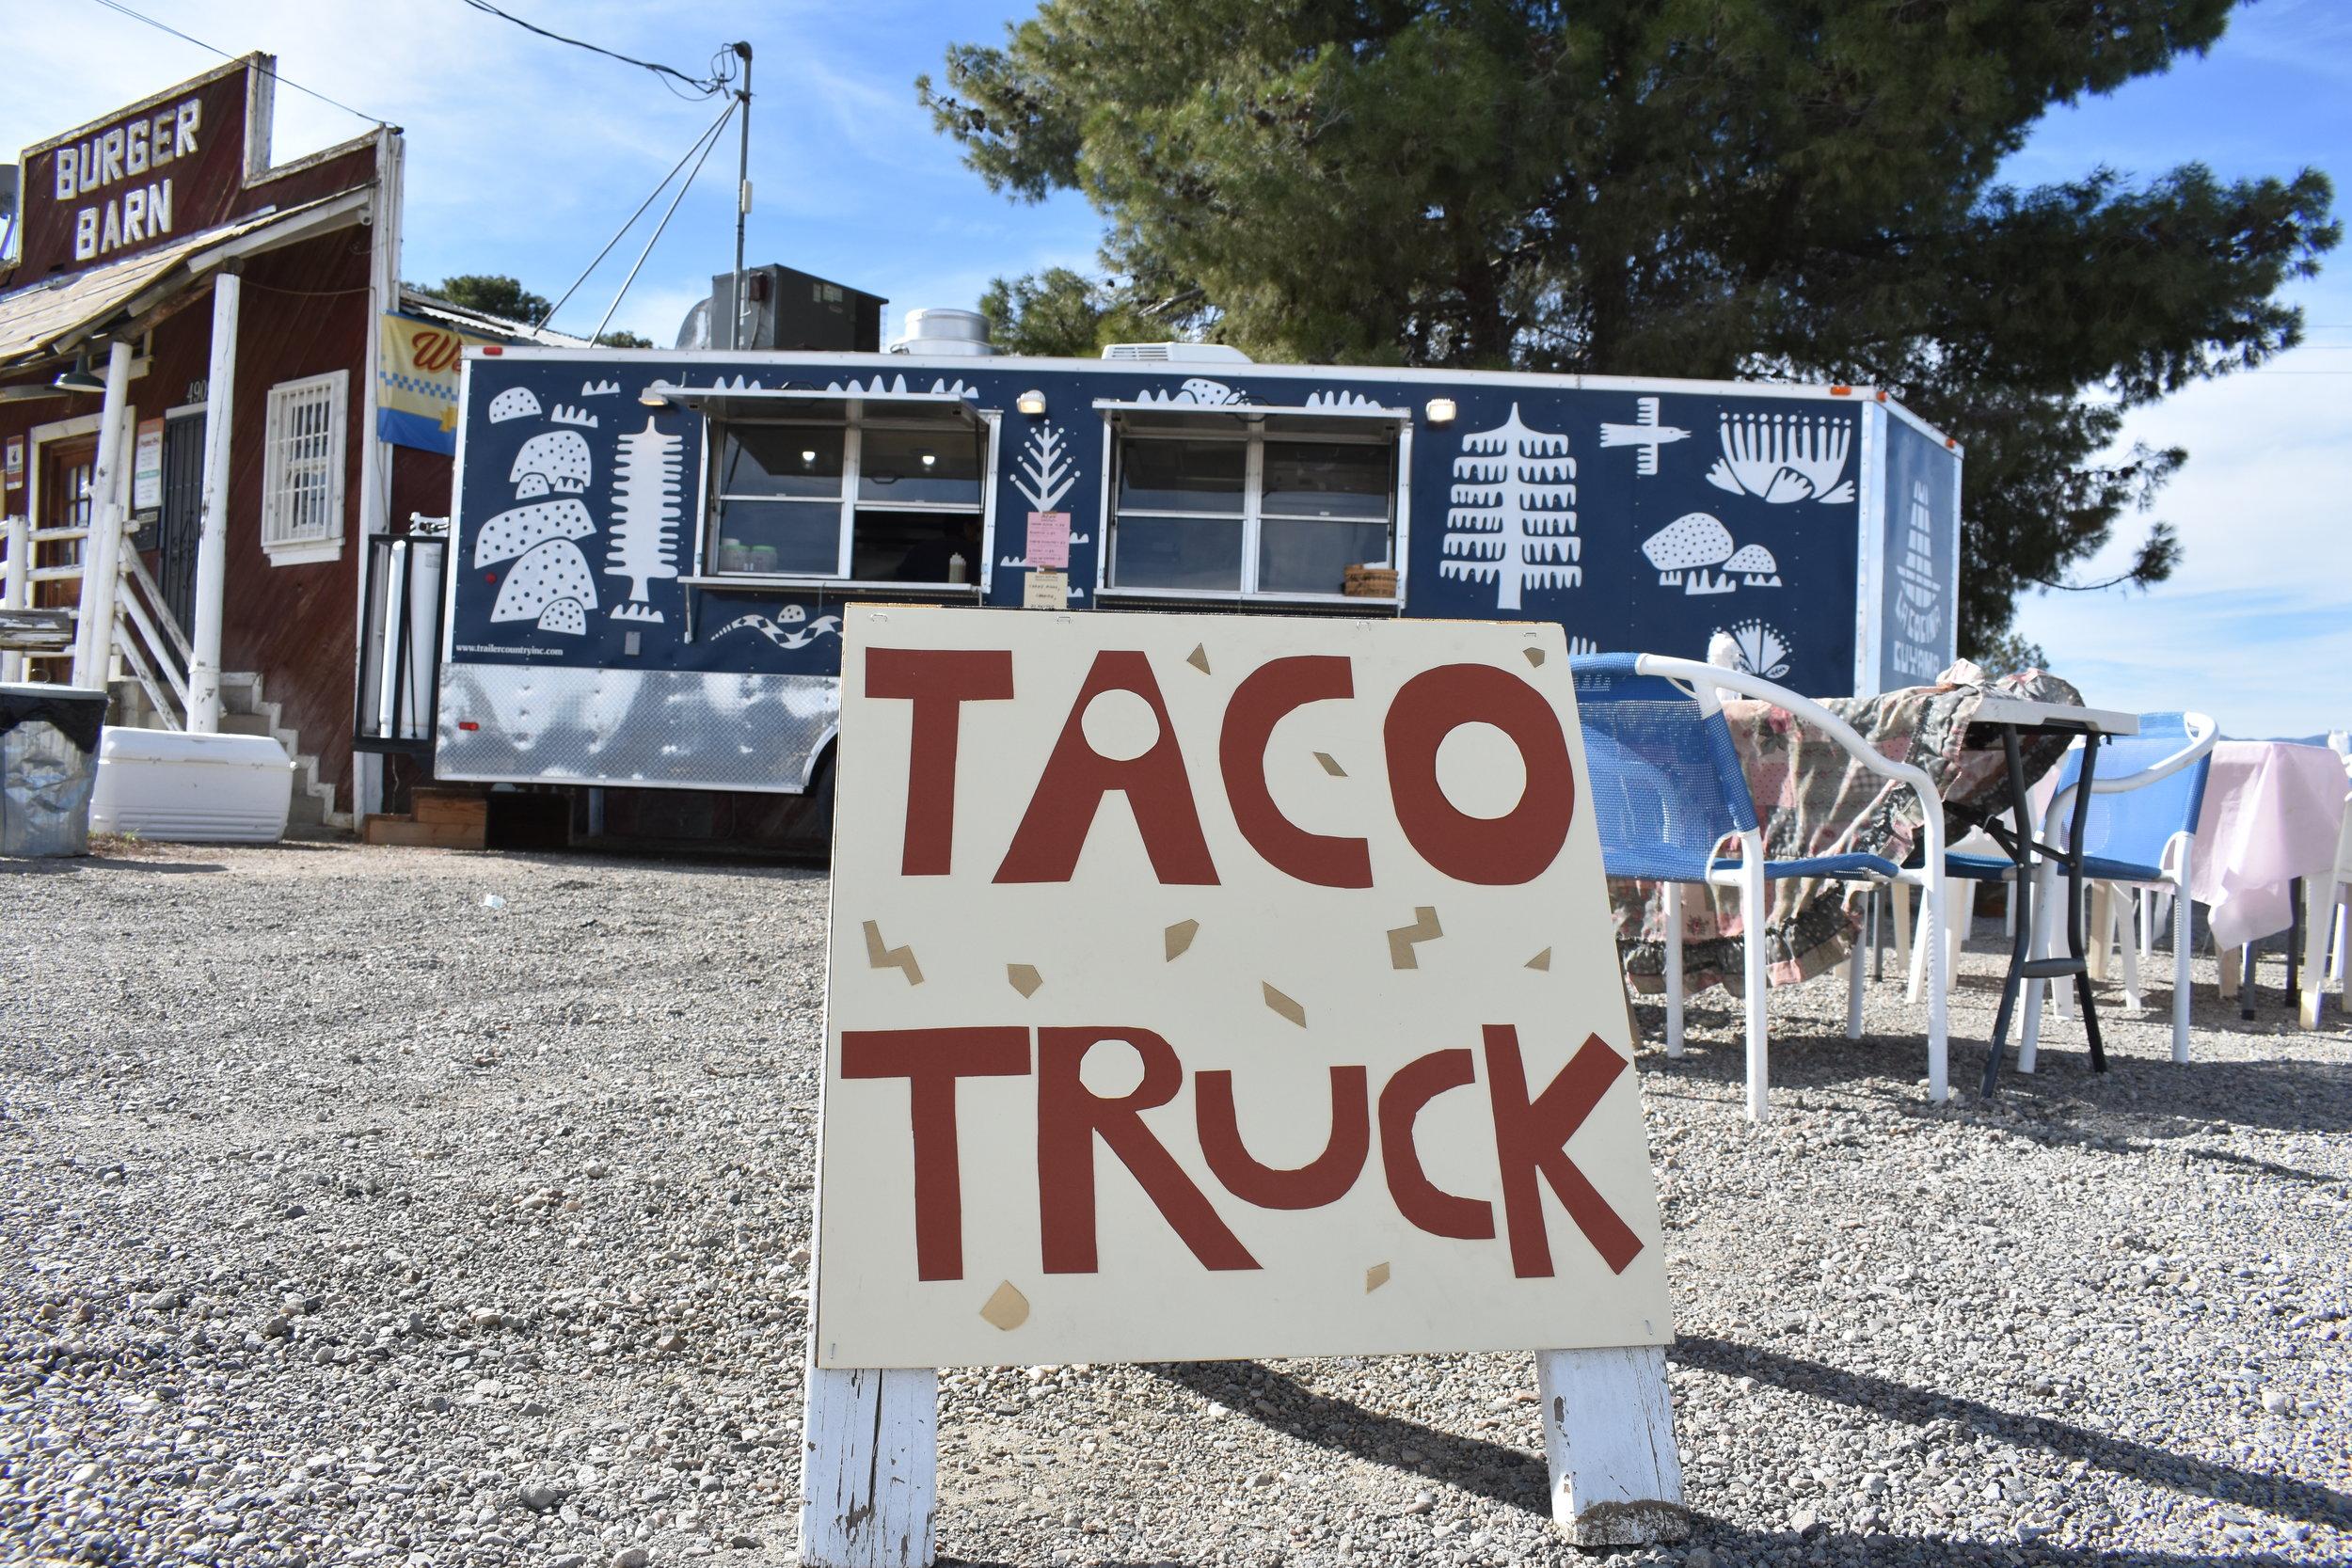 Taco-truck.JPG